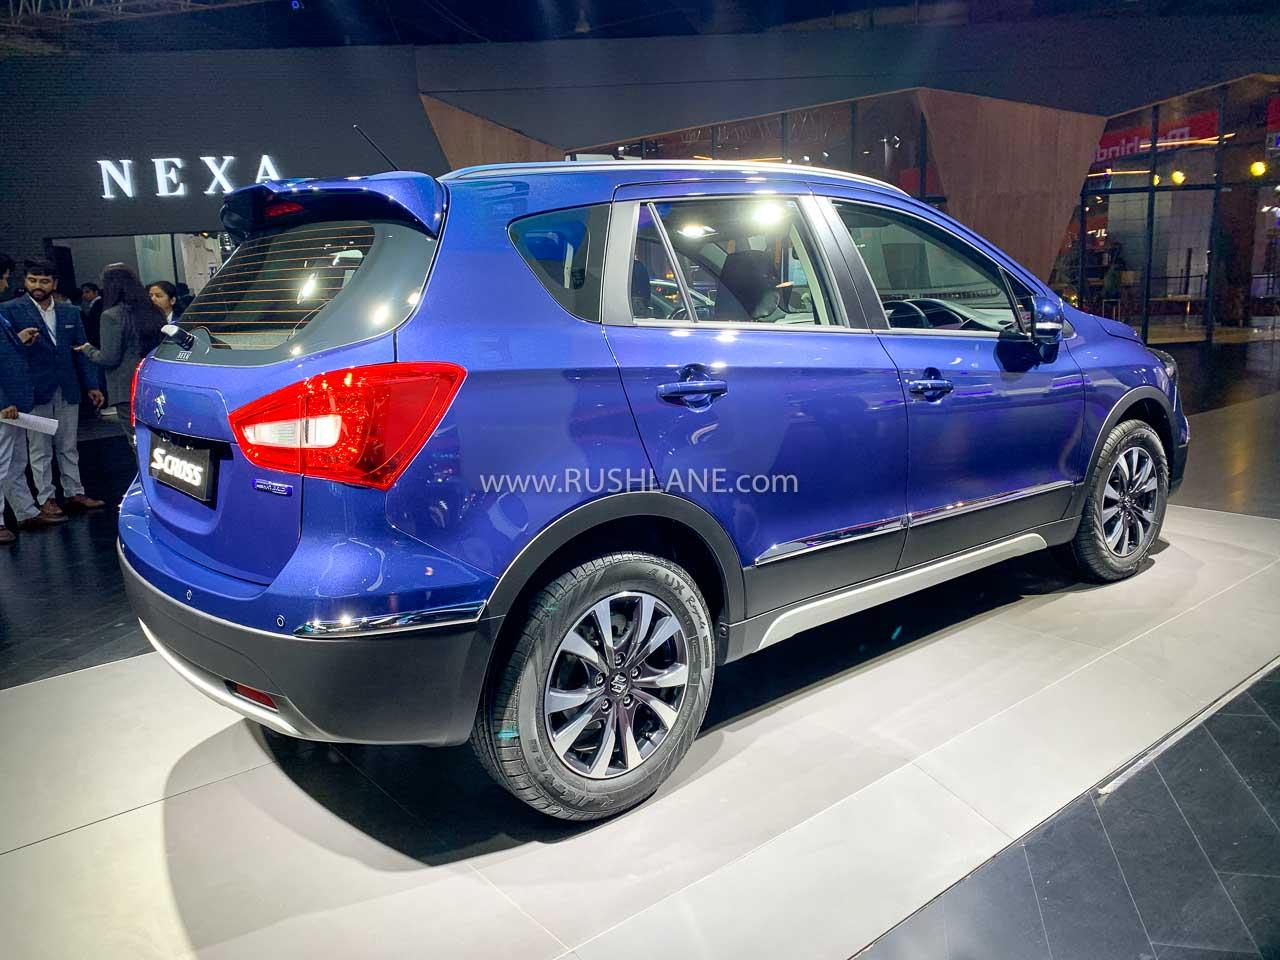 Maruti S-Cross petrol BS6 at Auto Expo 2020